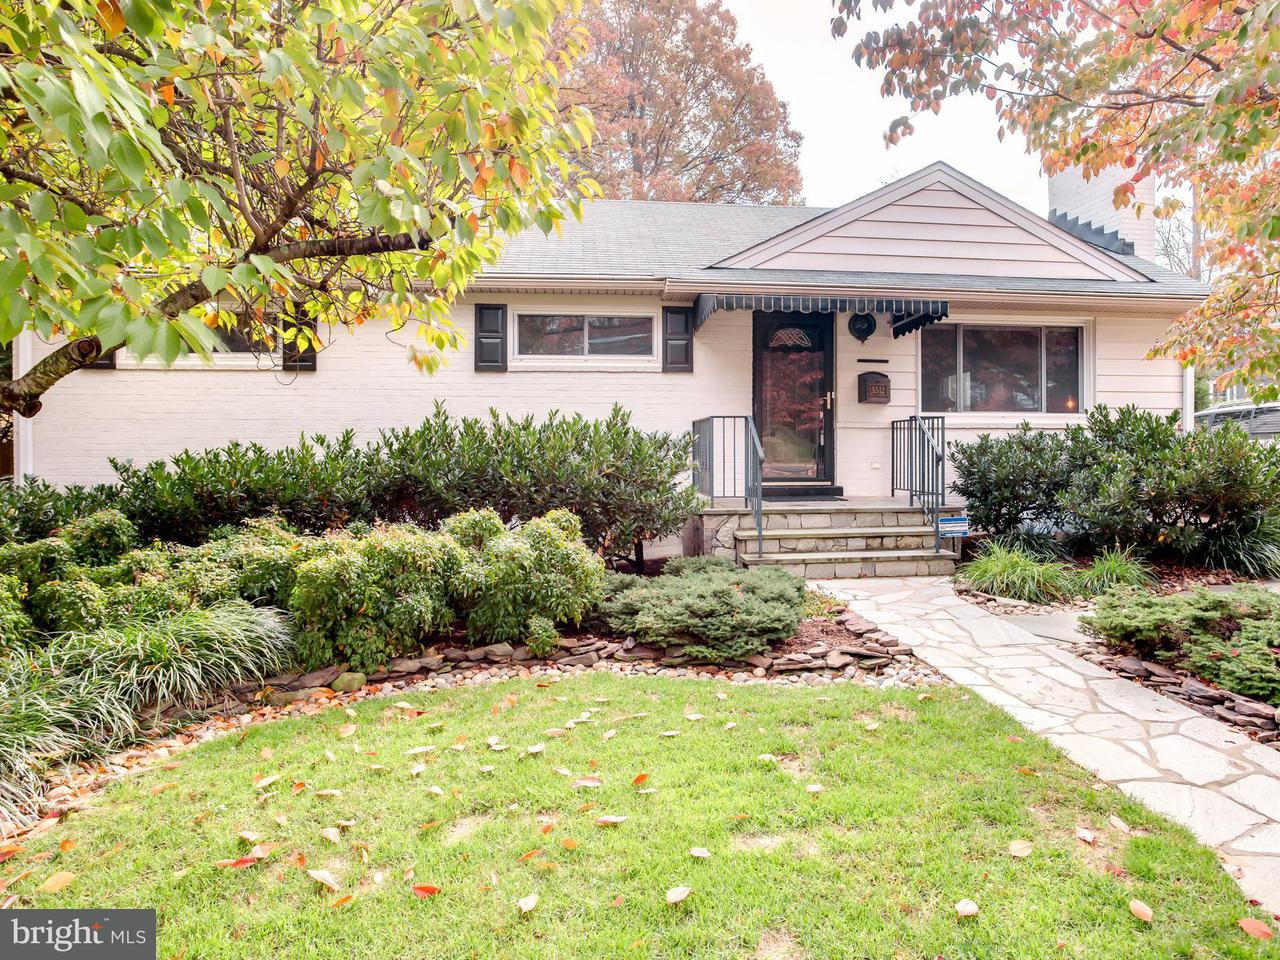 Single Family Home for Sale at 5512 WILLIAMSBURG BLVD 5512 WILLIAMSBURG BLVD Arlington, Virginia 22207 United States